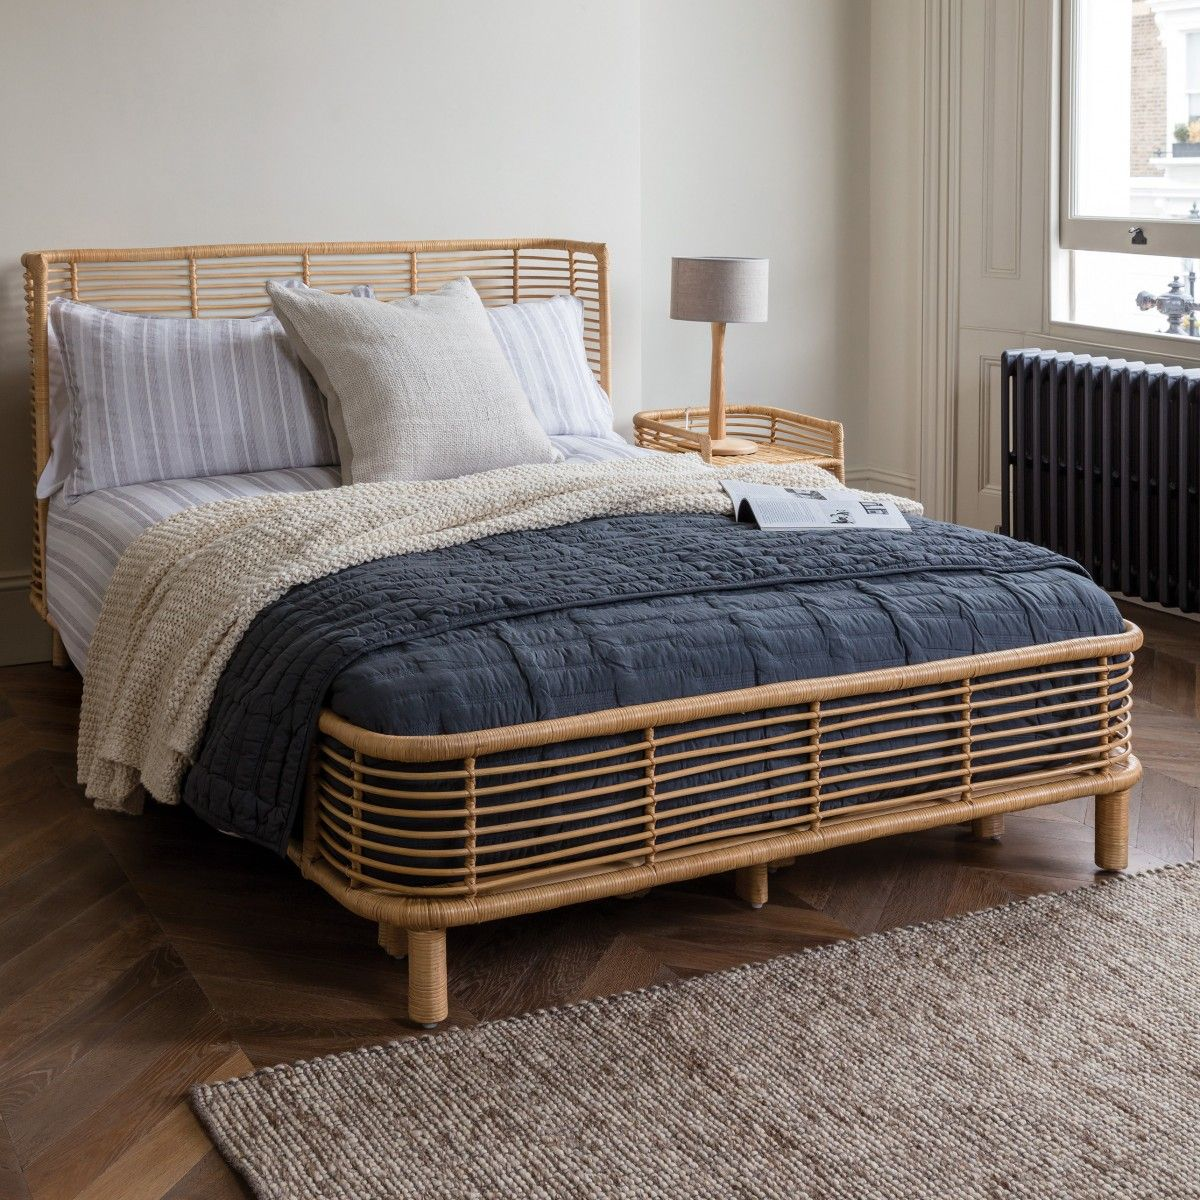 NADIA Natural handwoven rattan kingsize bed frame 150cm in